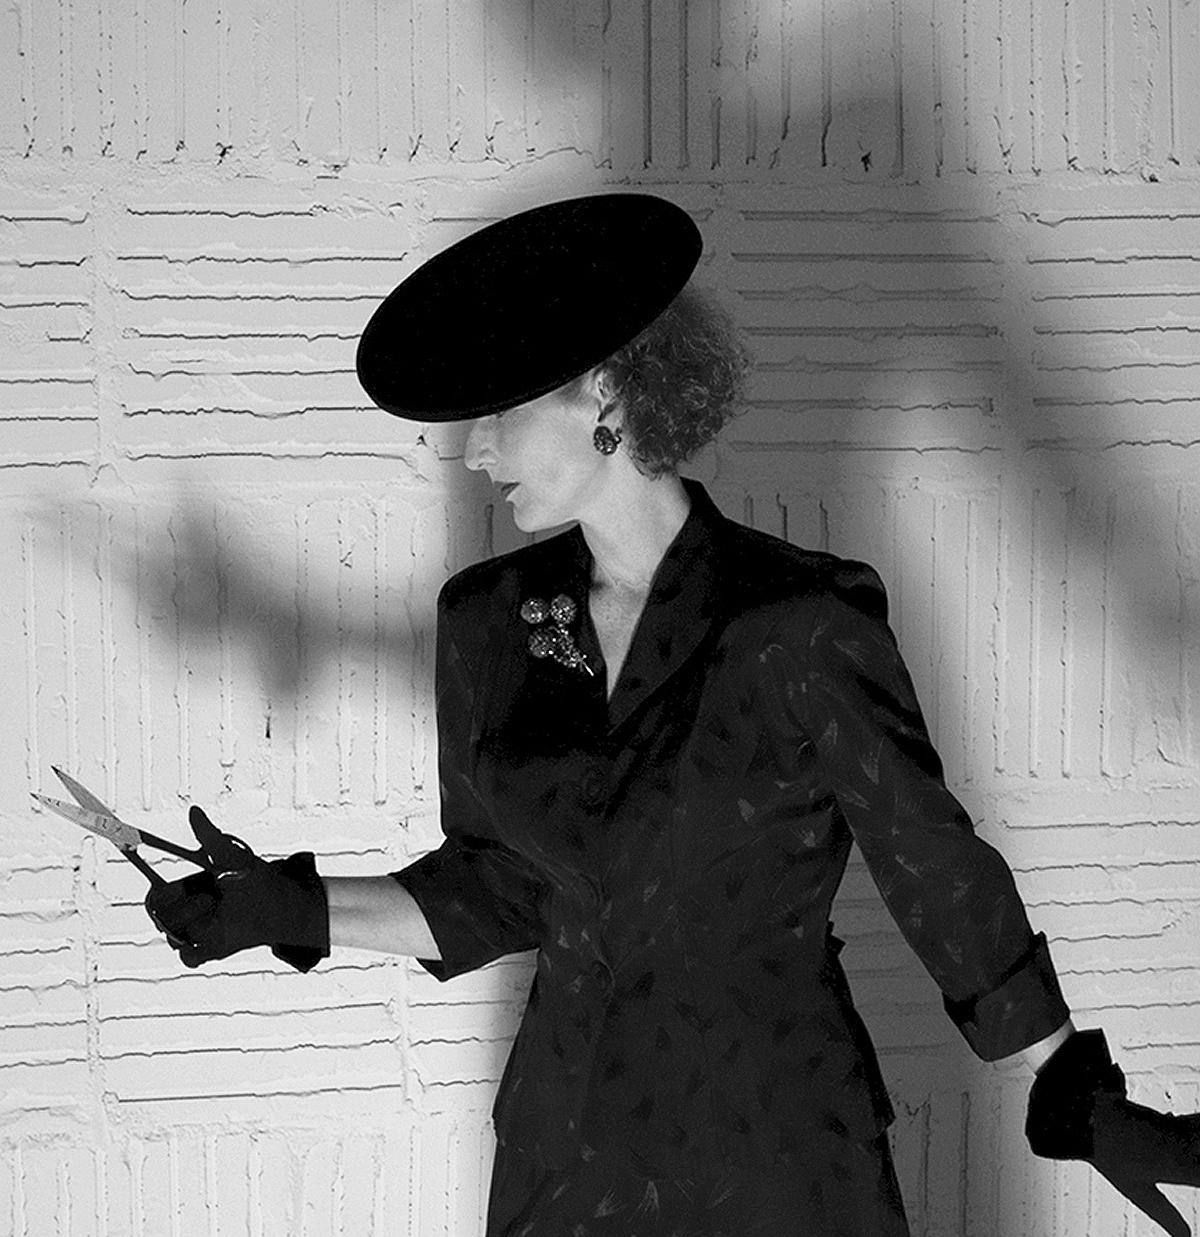 1940s noir femme fatale style vintage suits model Amy Mayberry